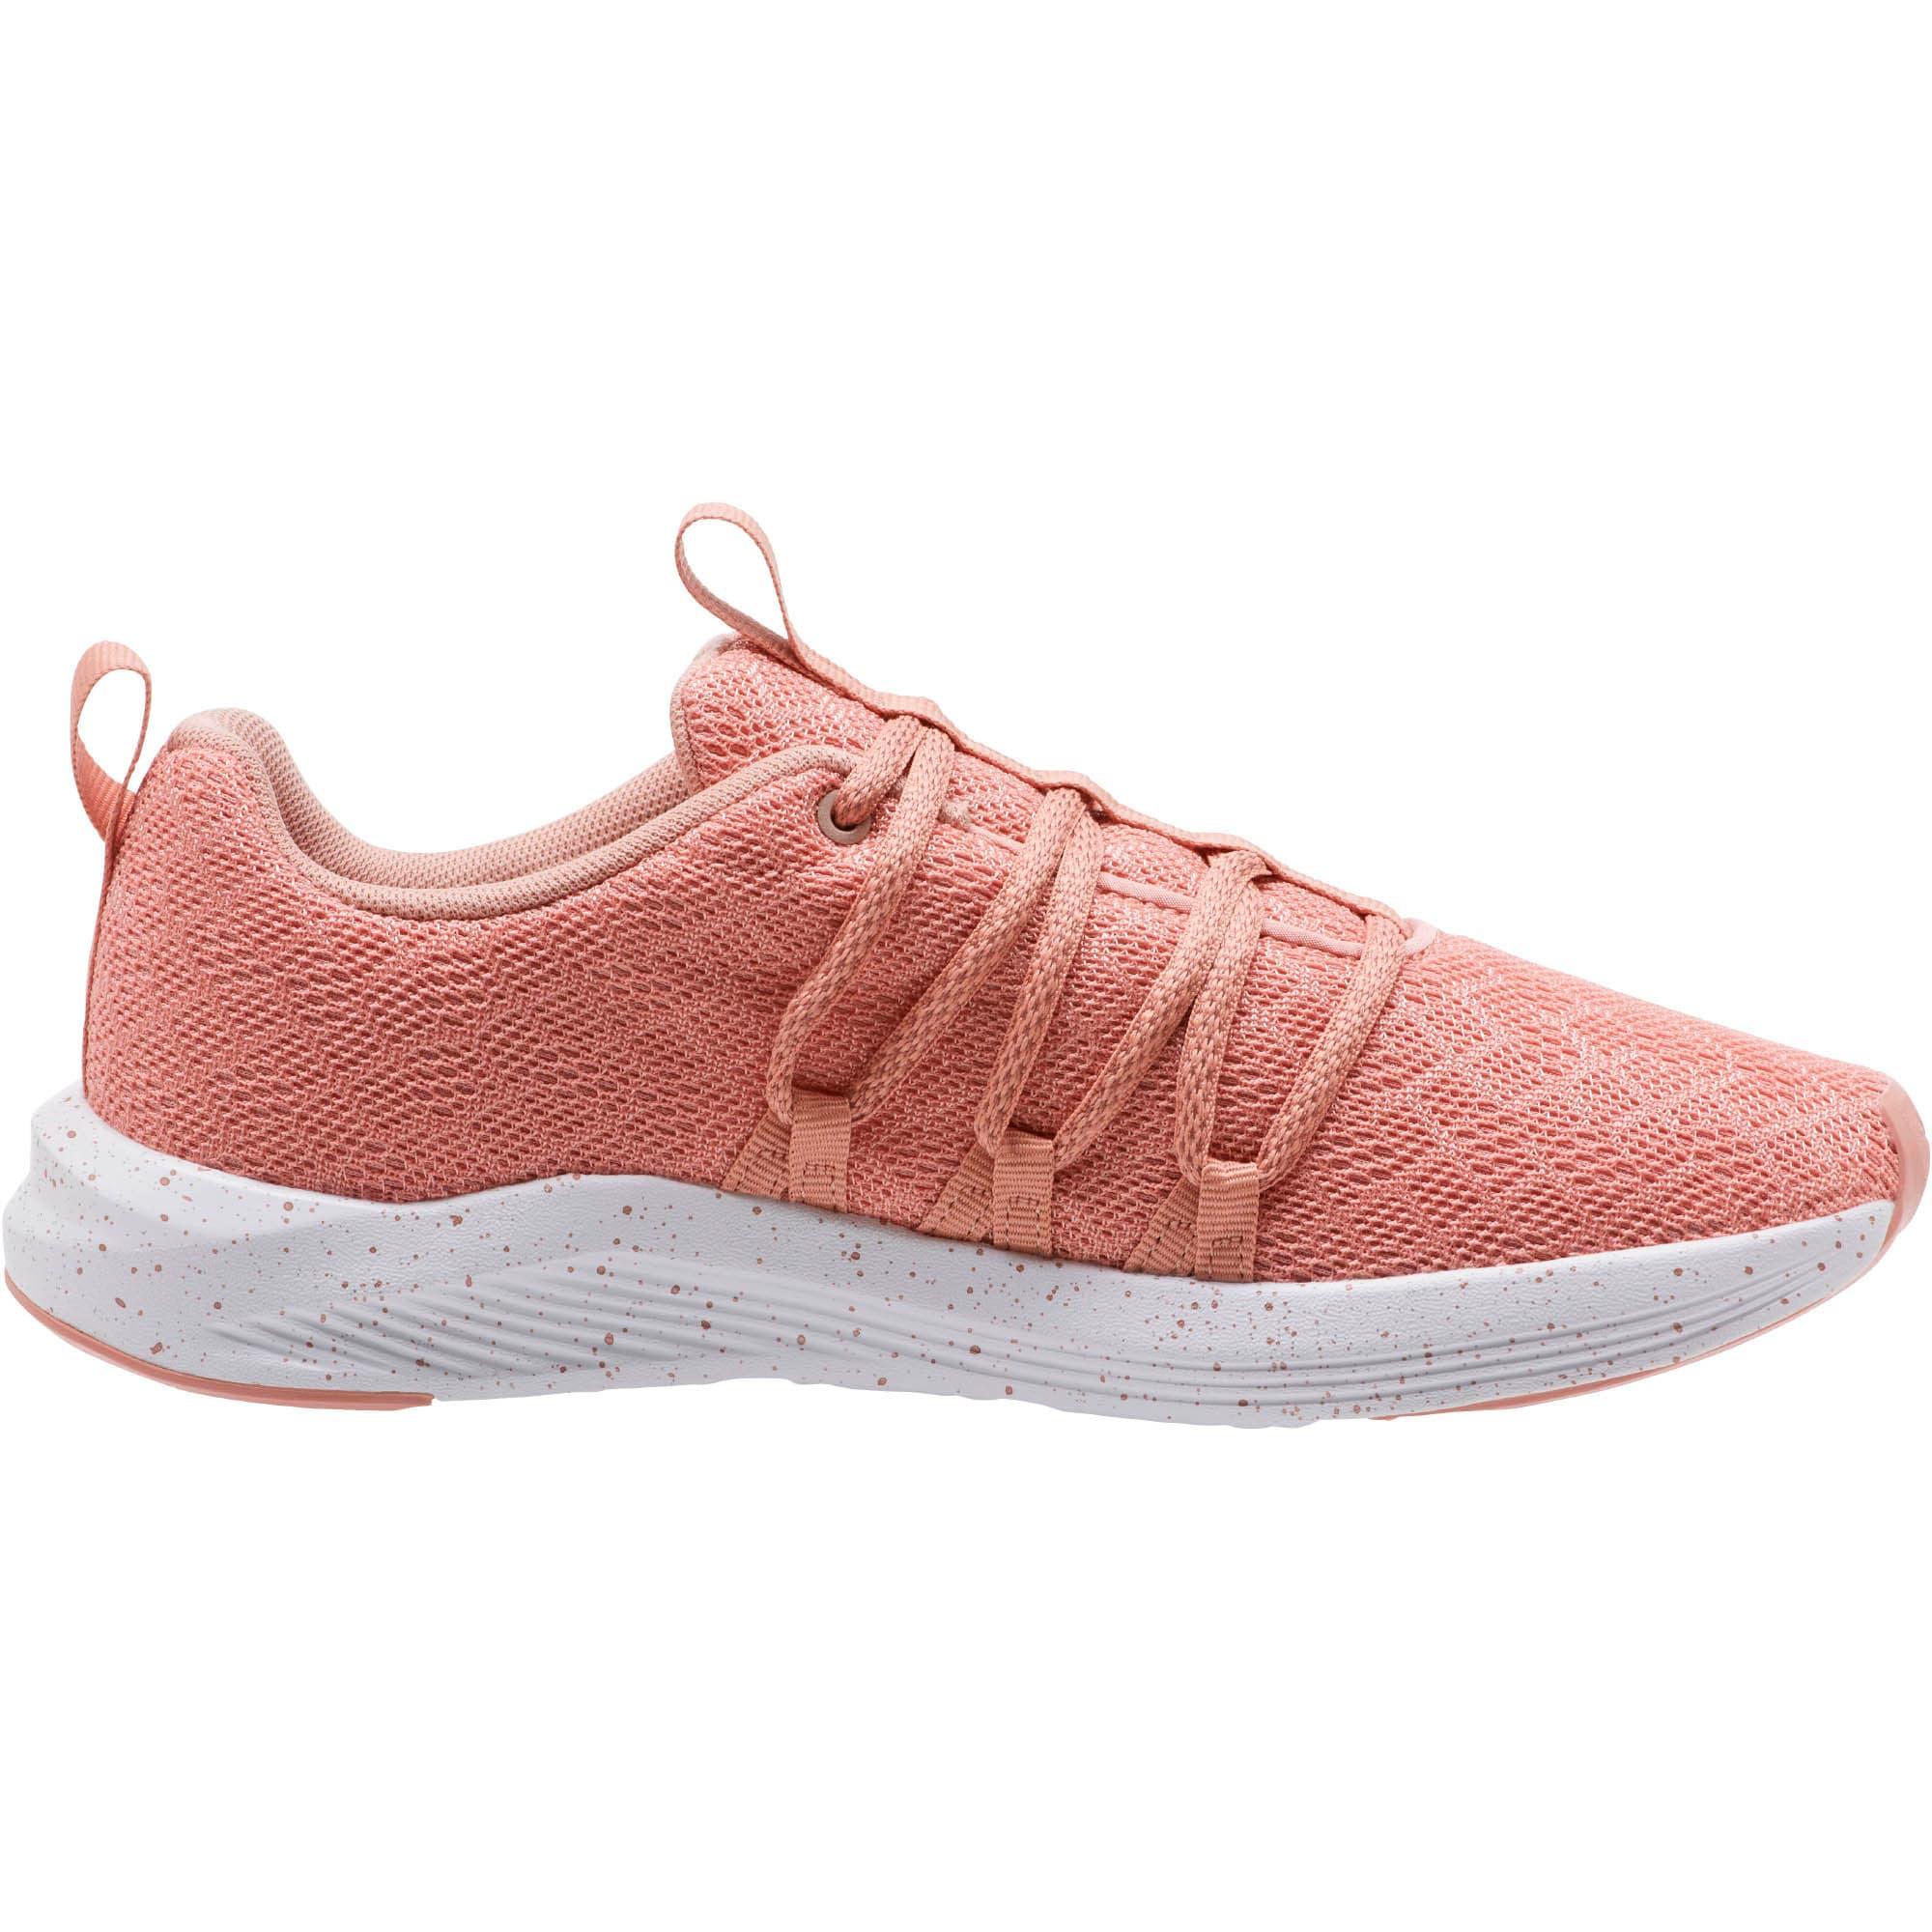 Thumbnail 3 of Prowl Alt Mesh Speckle Women's Training Shoes, Peach Beige-Puma White, medium